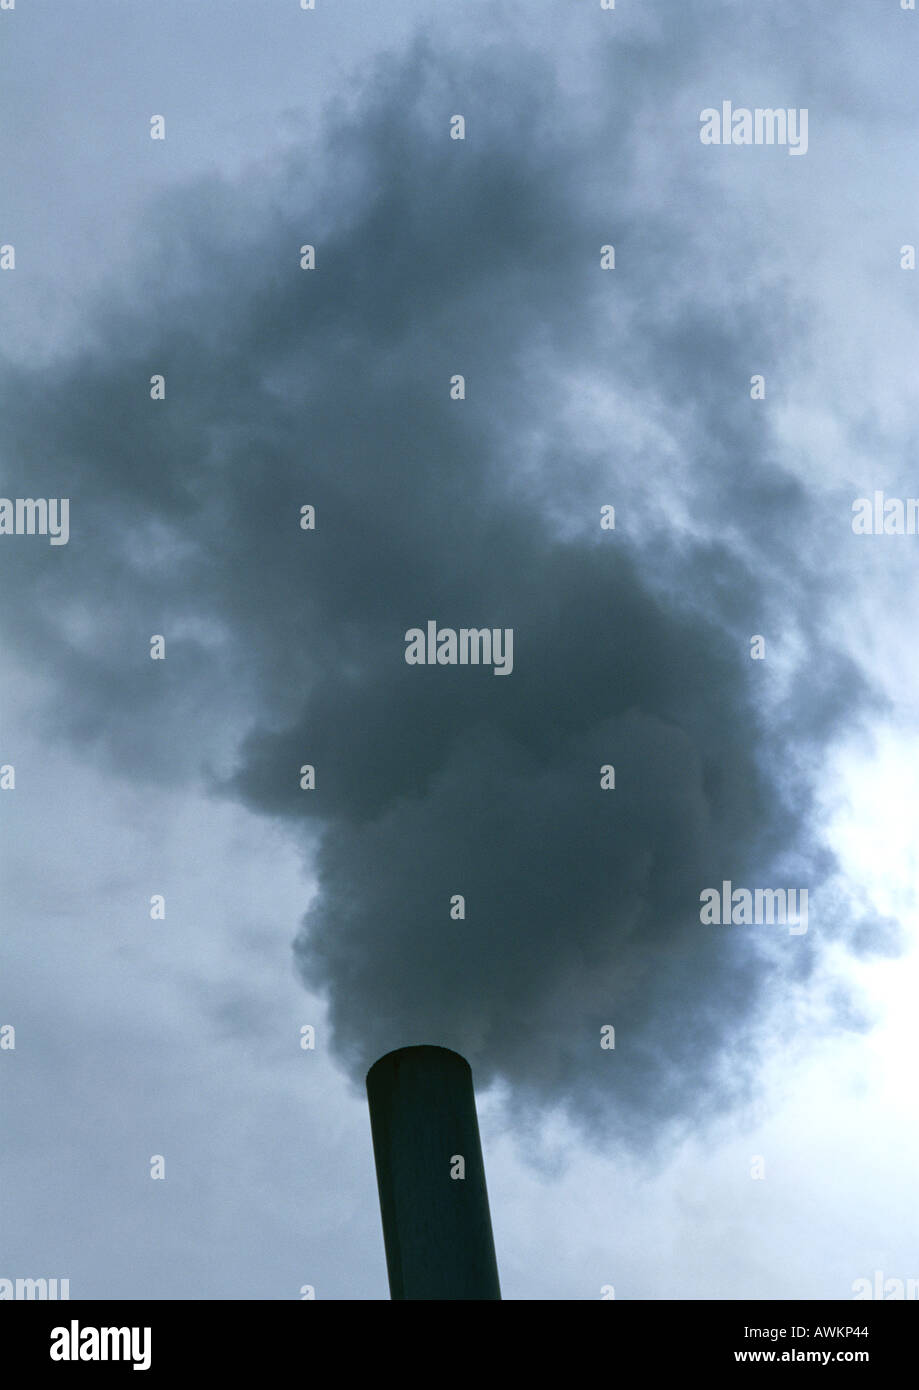 Smoke from a smoke stack, low angle view Stock Photo